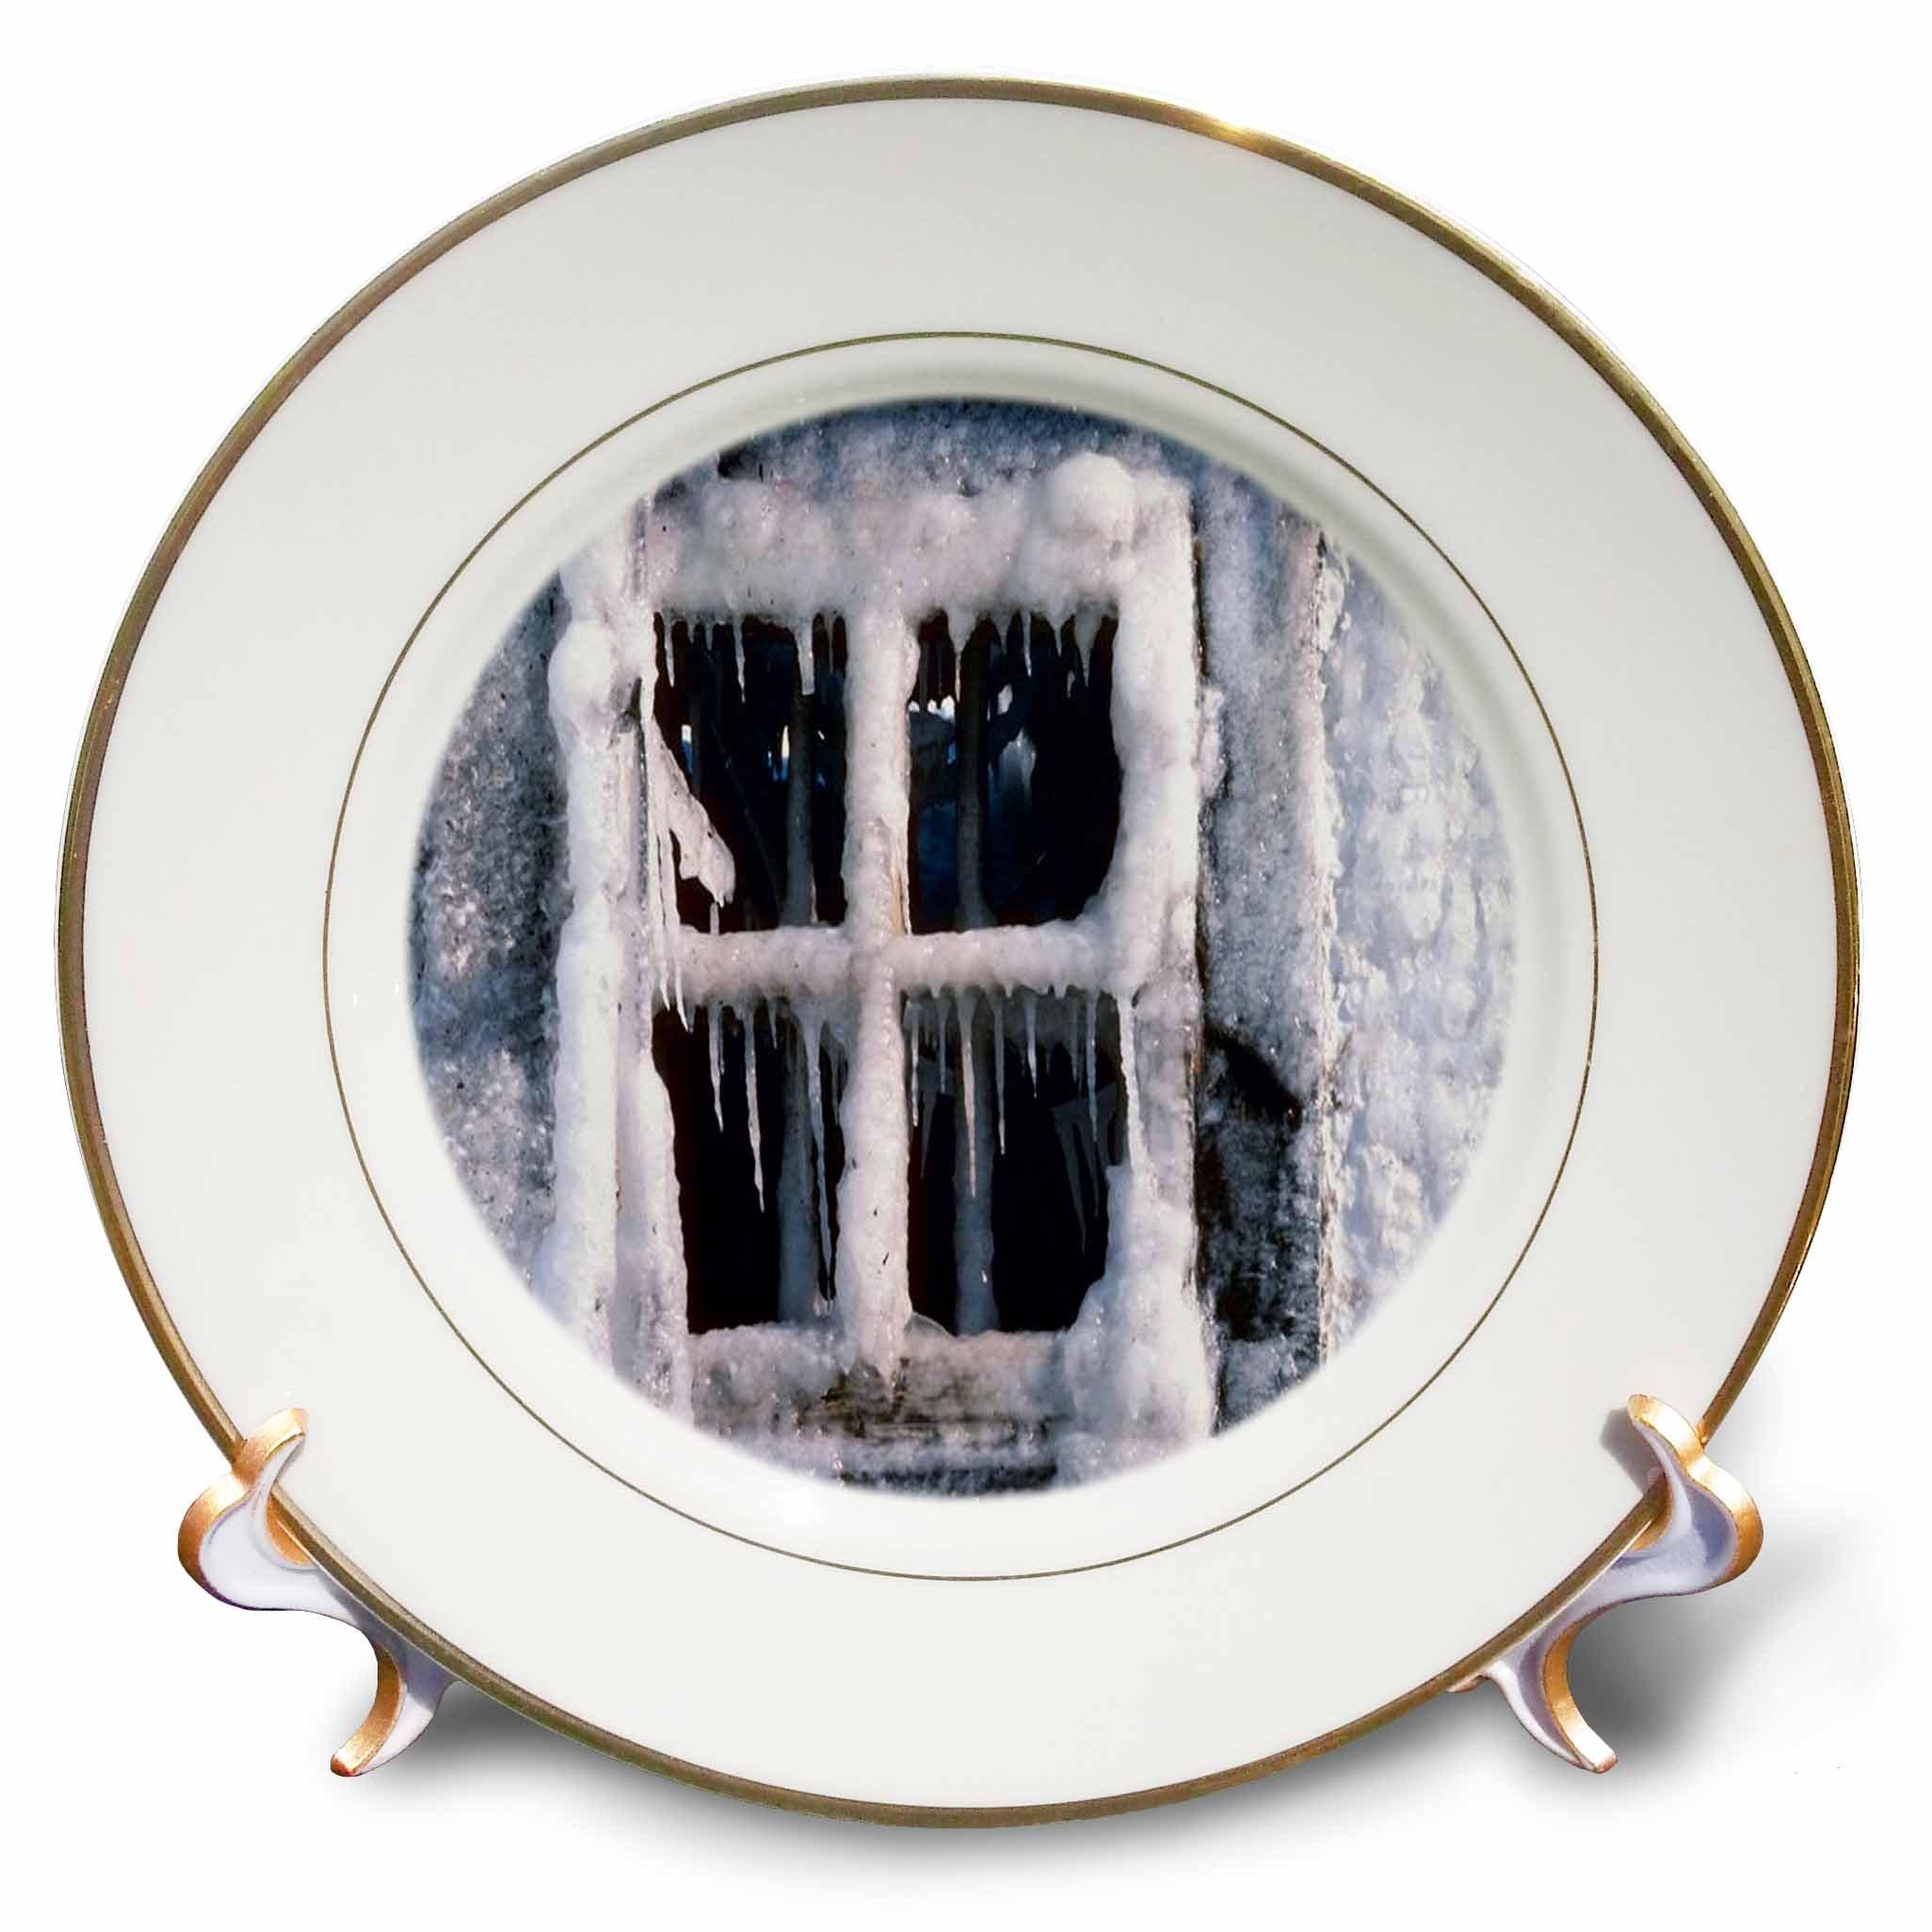 3dRose TDSwhite – Winter Seasonal Nature Photos - Snowed In Window - 8 inch Porcelain Plate (cp_284914_1)